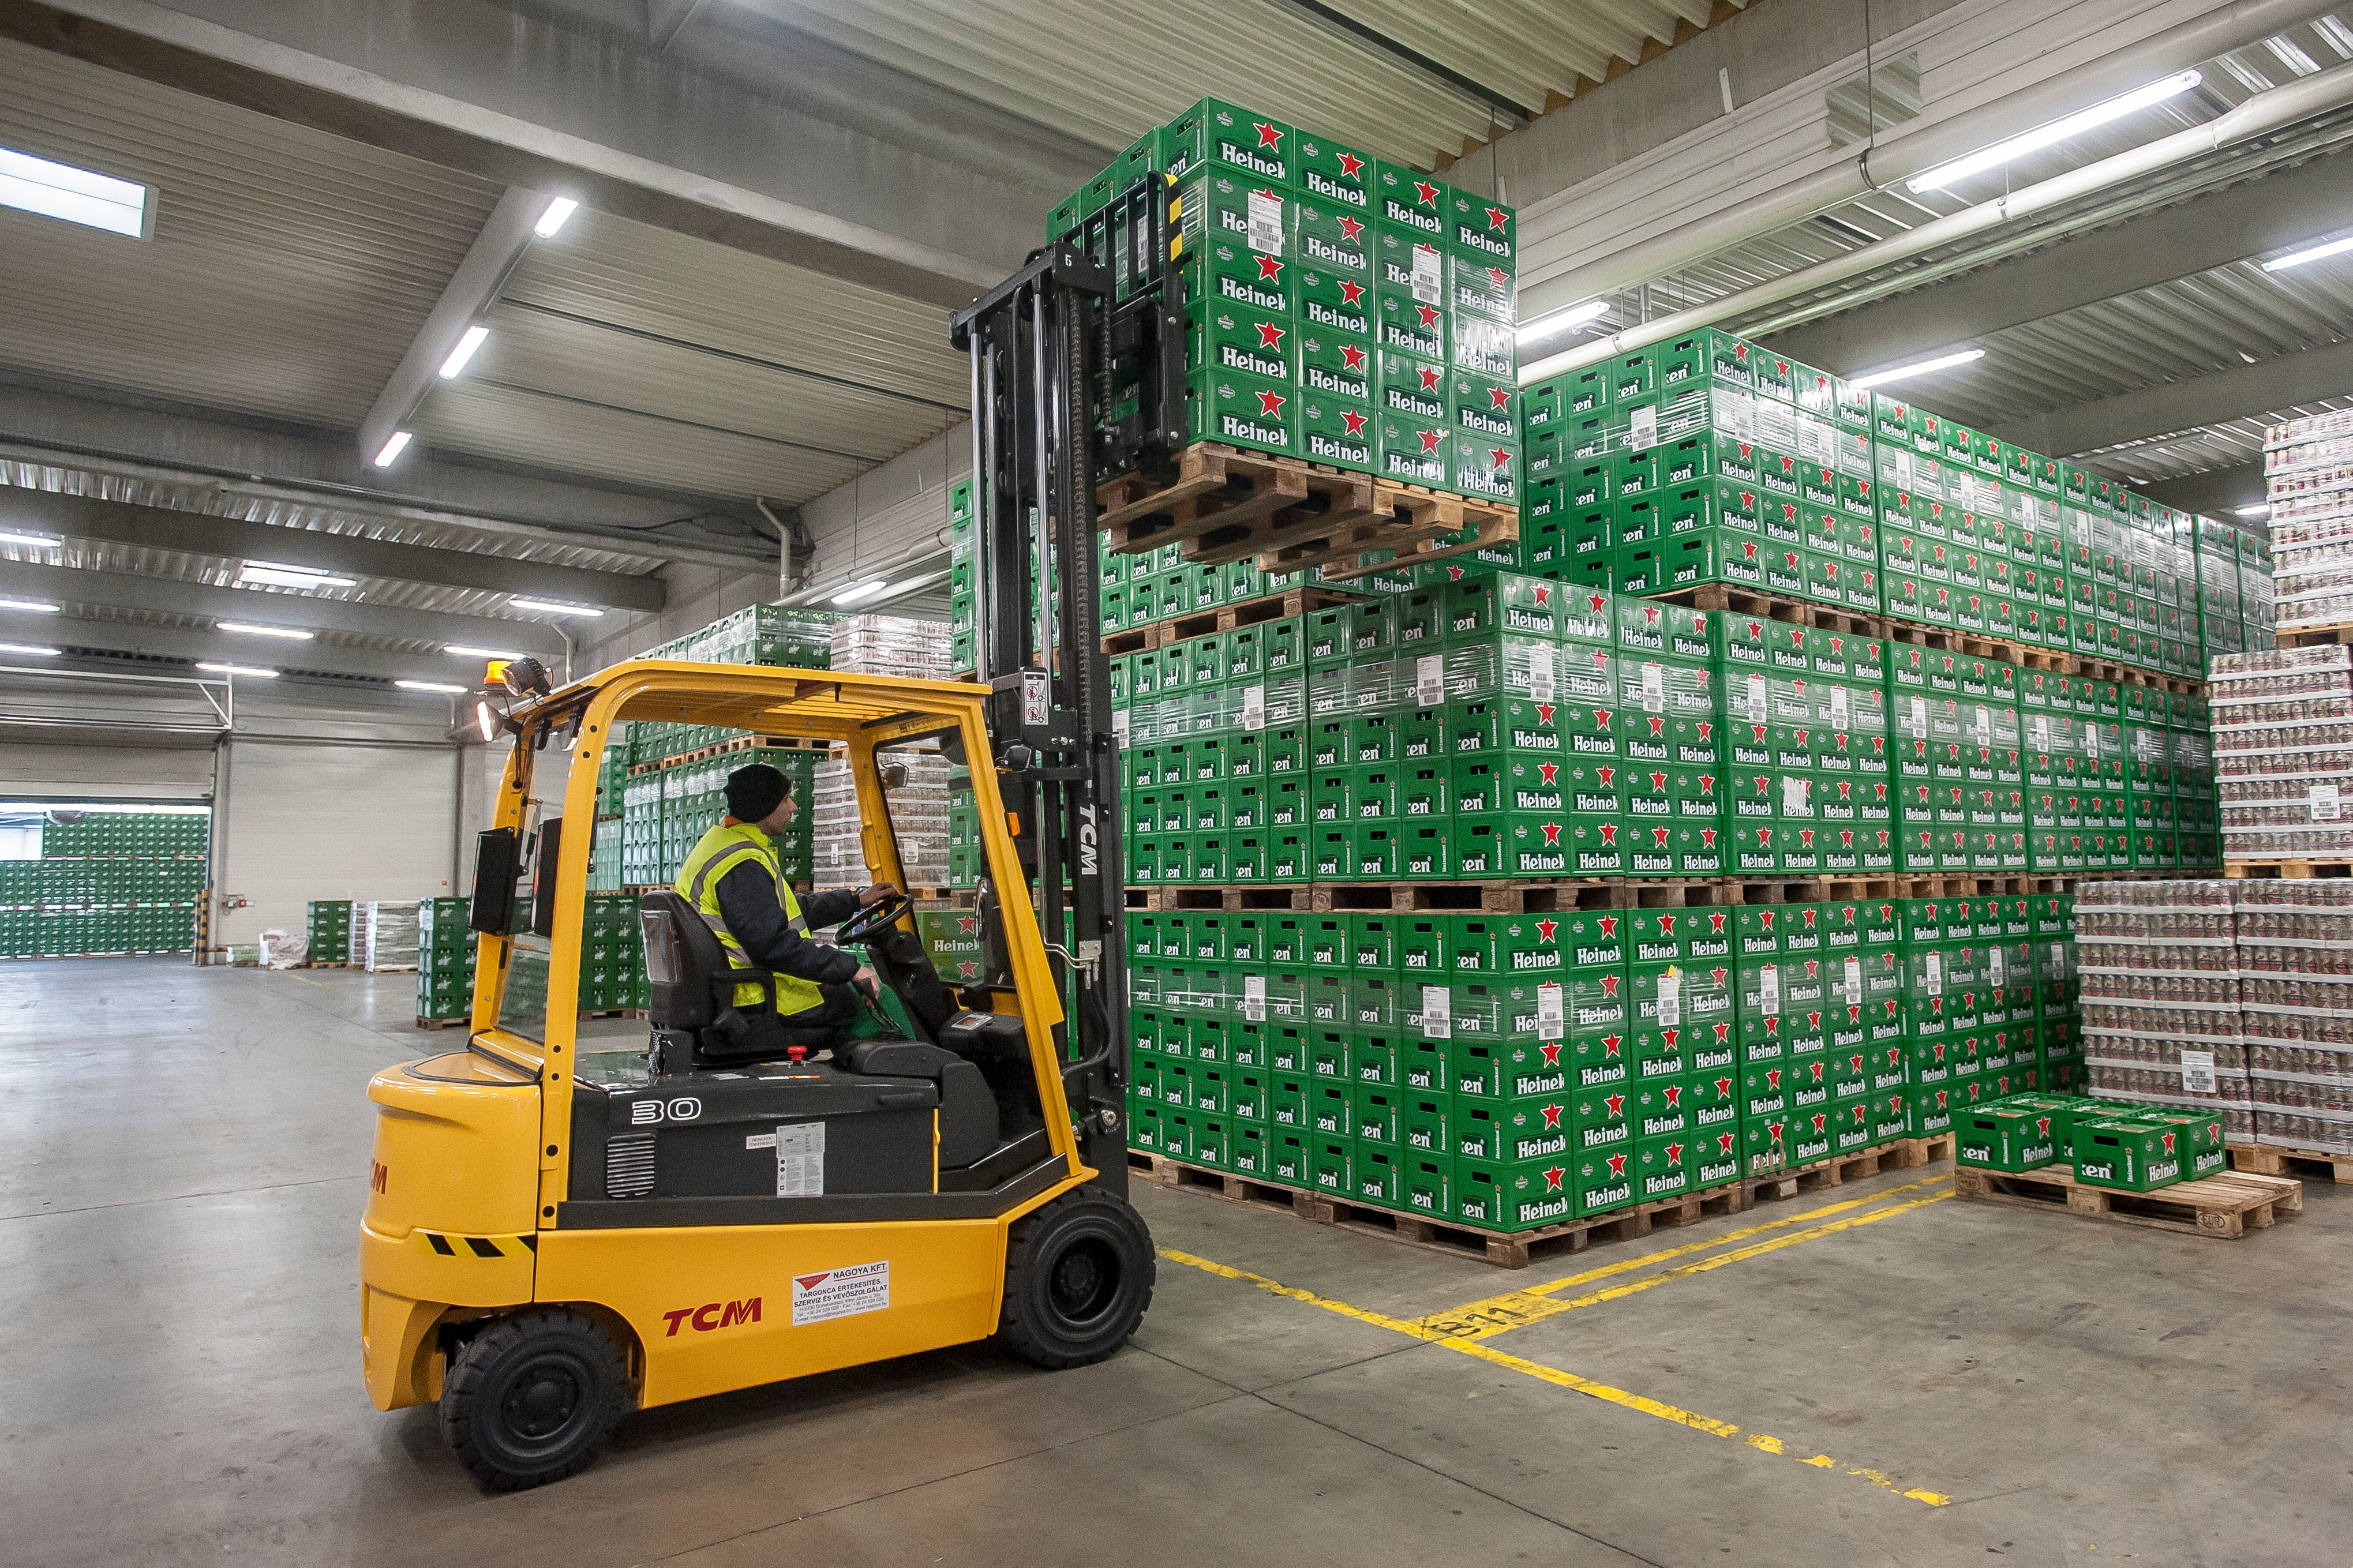 How TCM Forklifts Helped to Transform Heineken's Operation